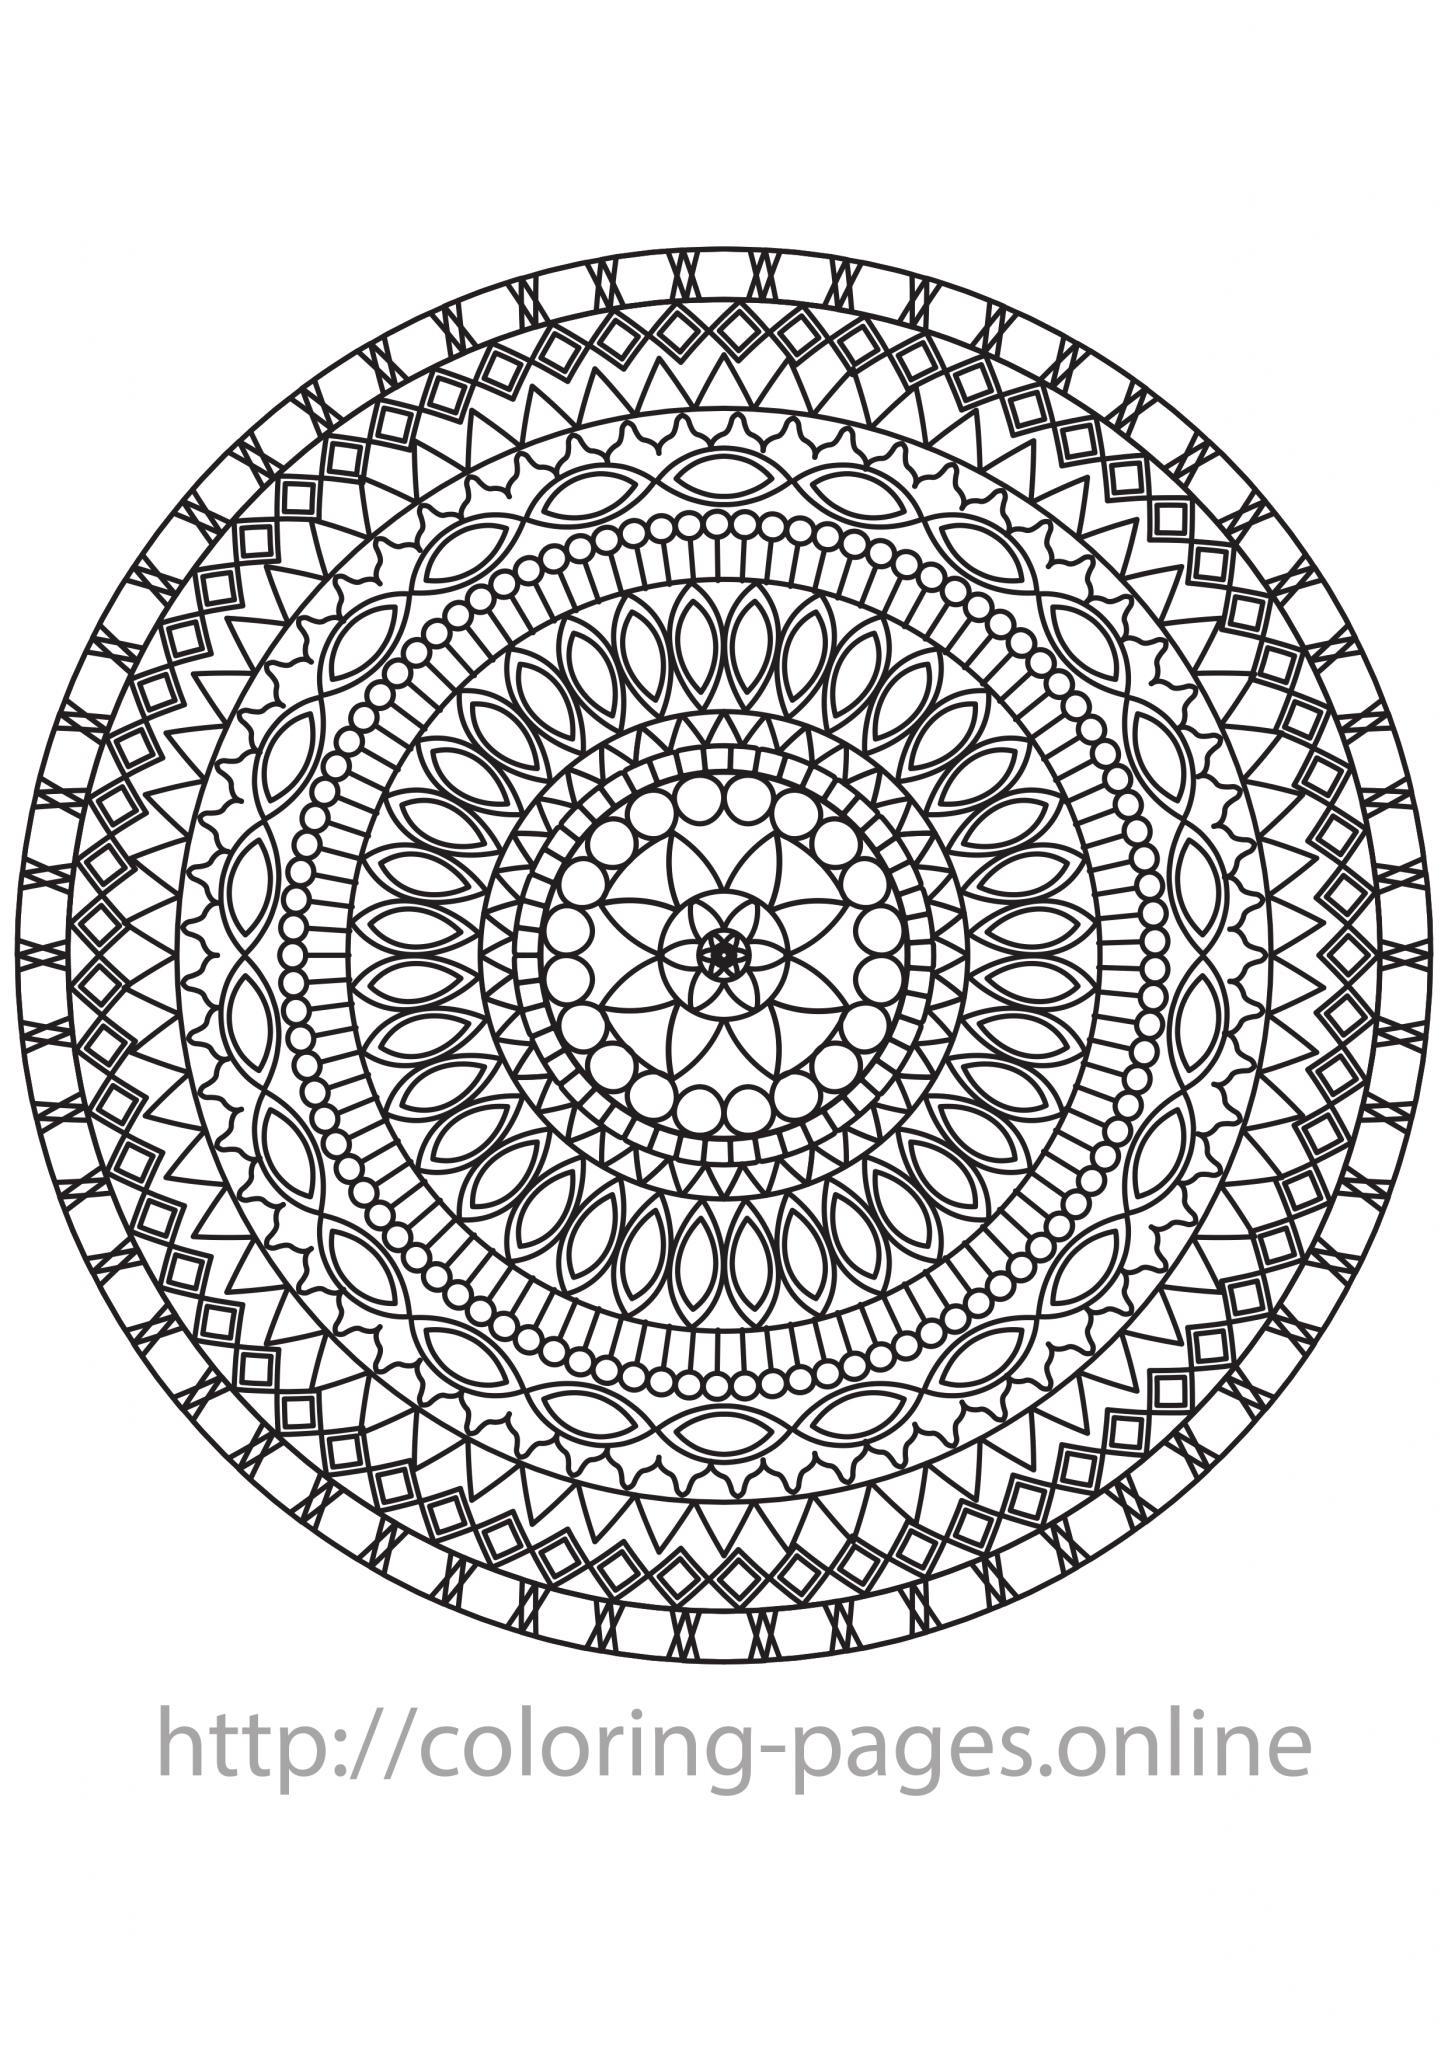 Gothic mandala coloring page